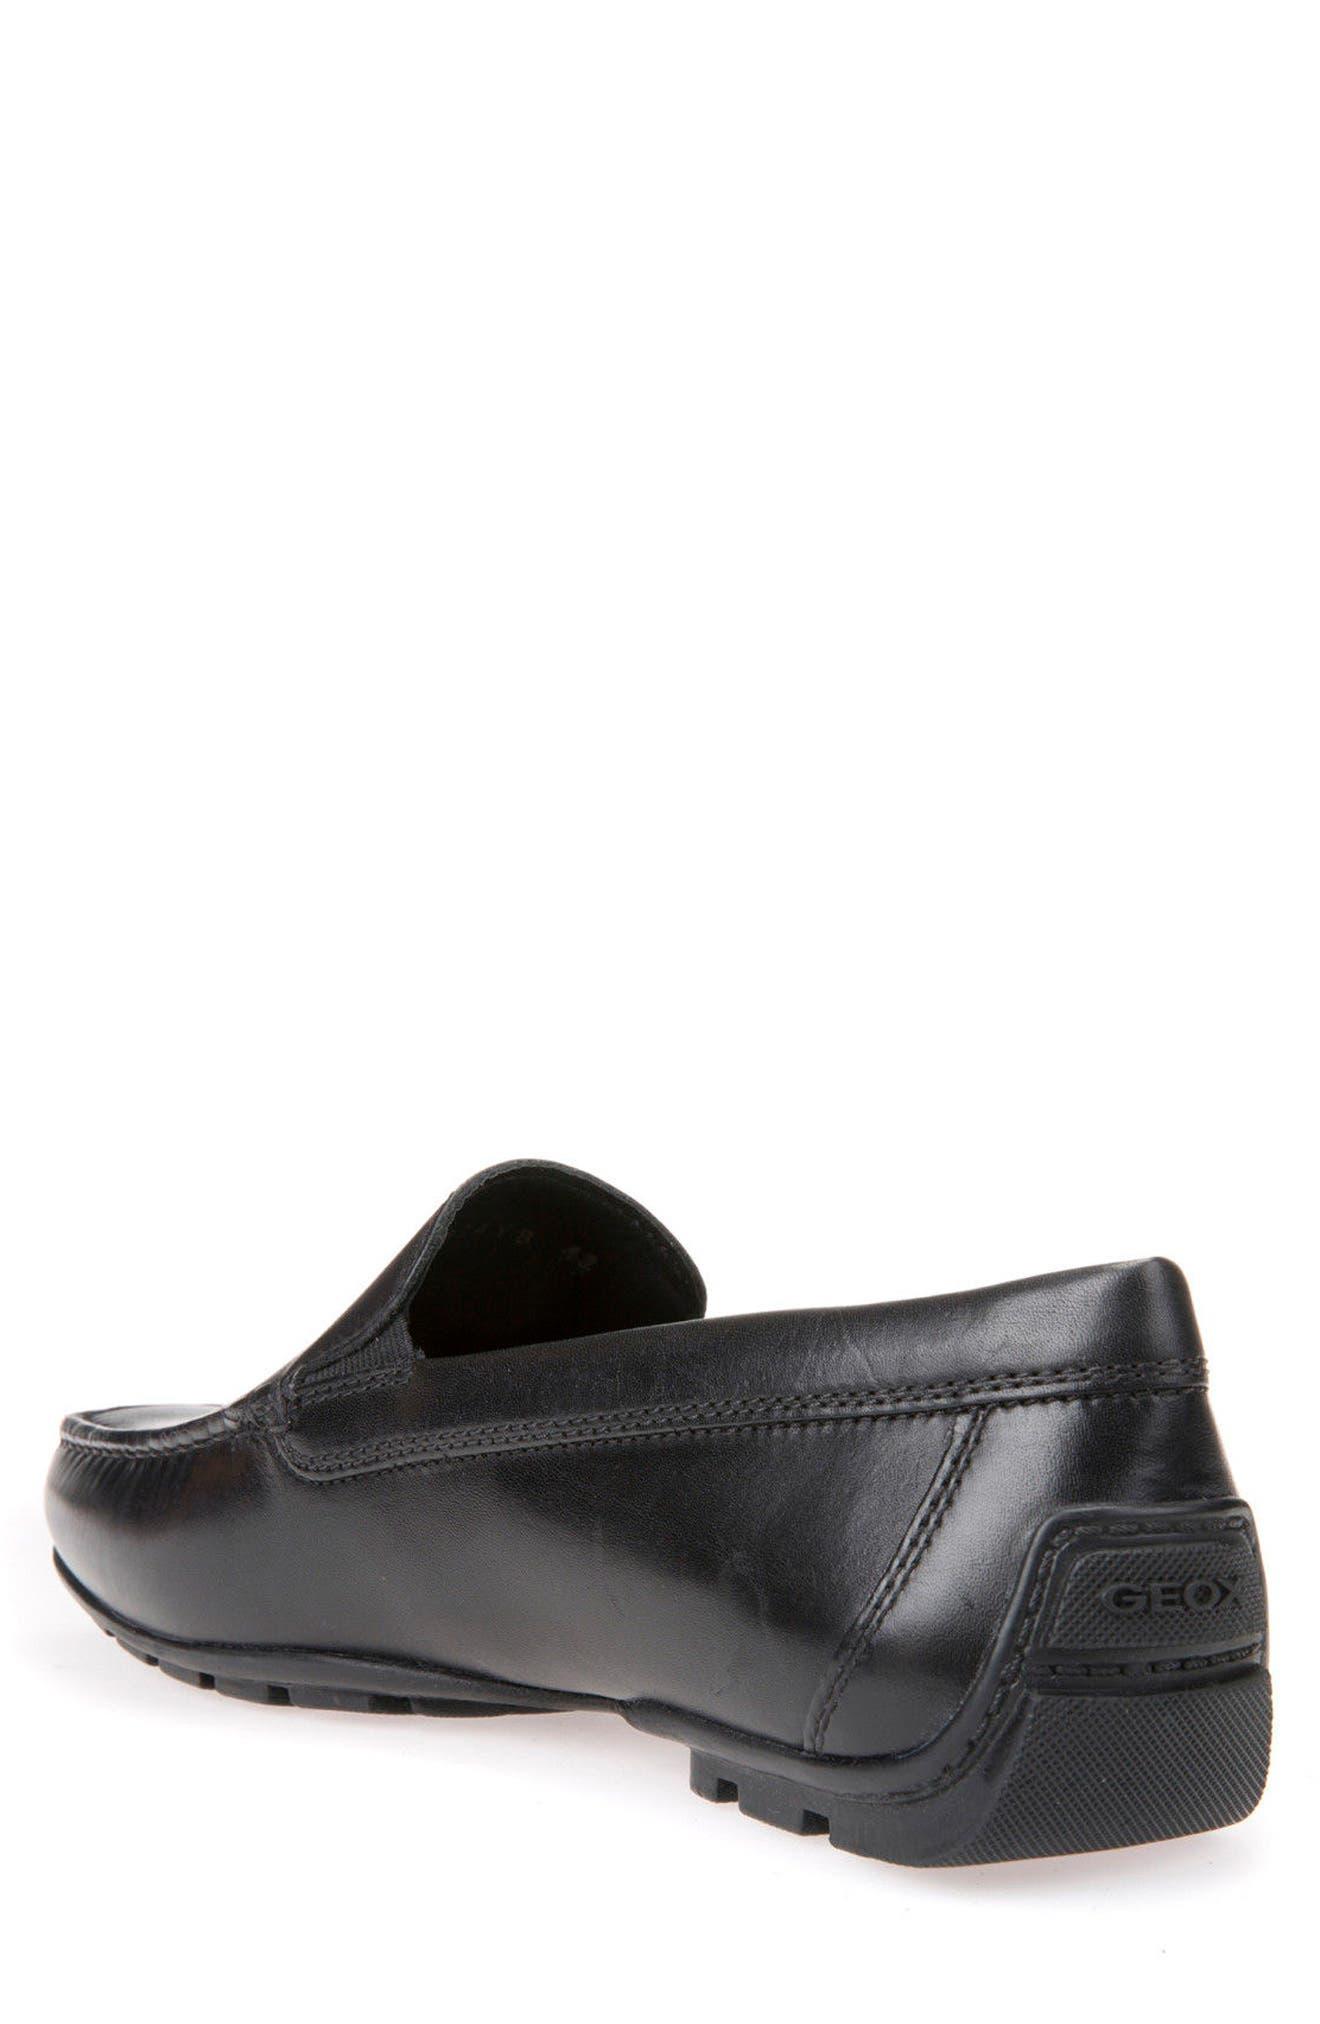 Moner 2Fit 2 Driving Moccasin,                             Alternate thumbnail 2, color,                             Black Leather